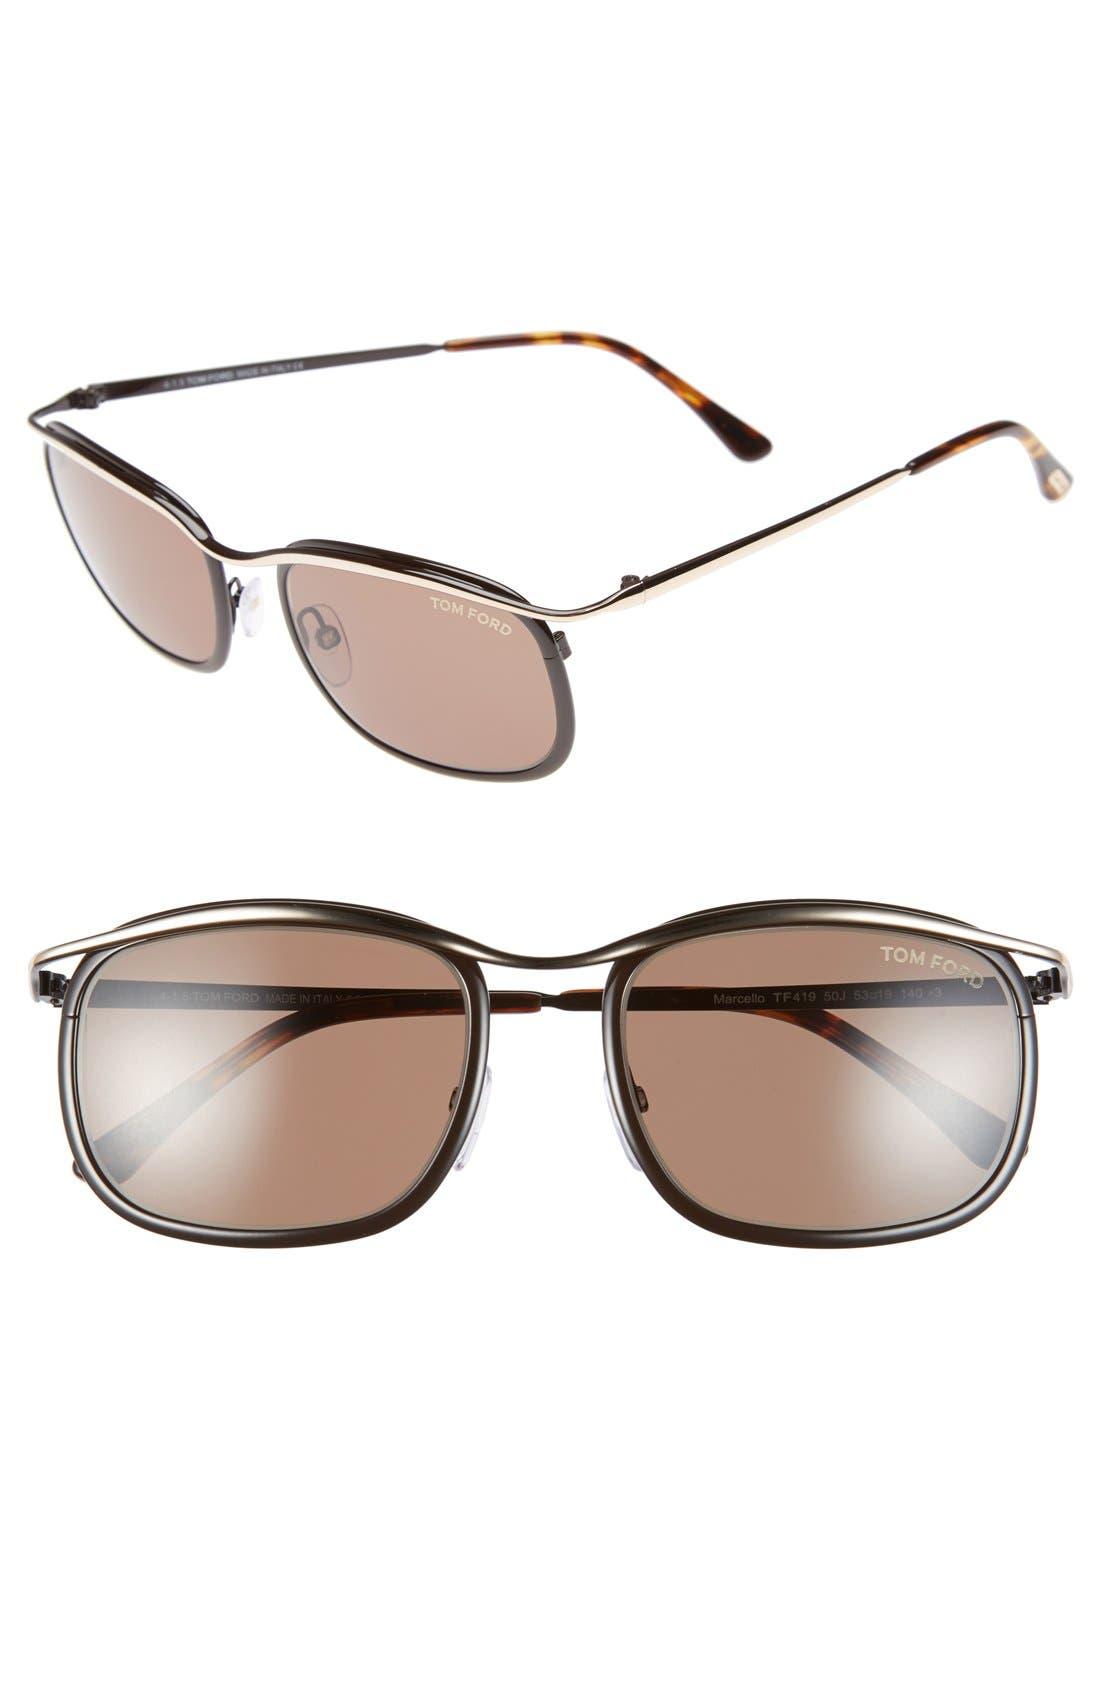 Main Image - Tom Ford 'Marcello' 53mm Sunglasses